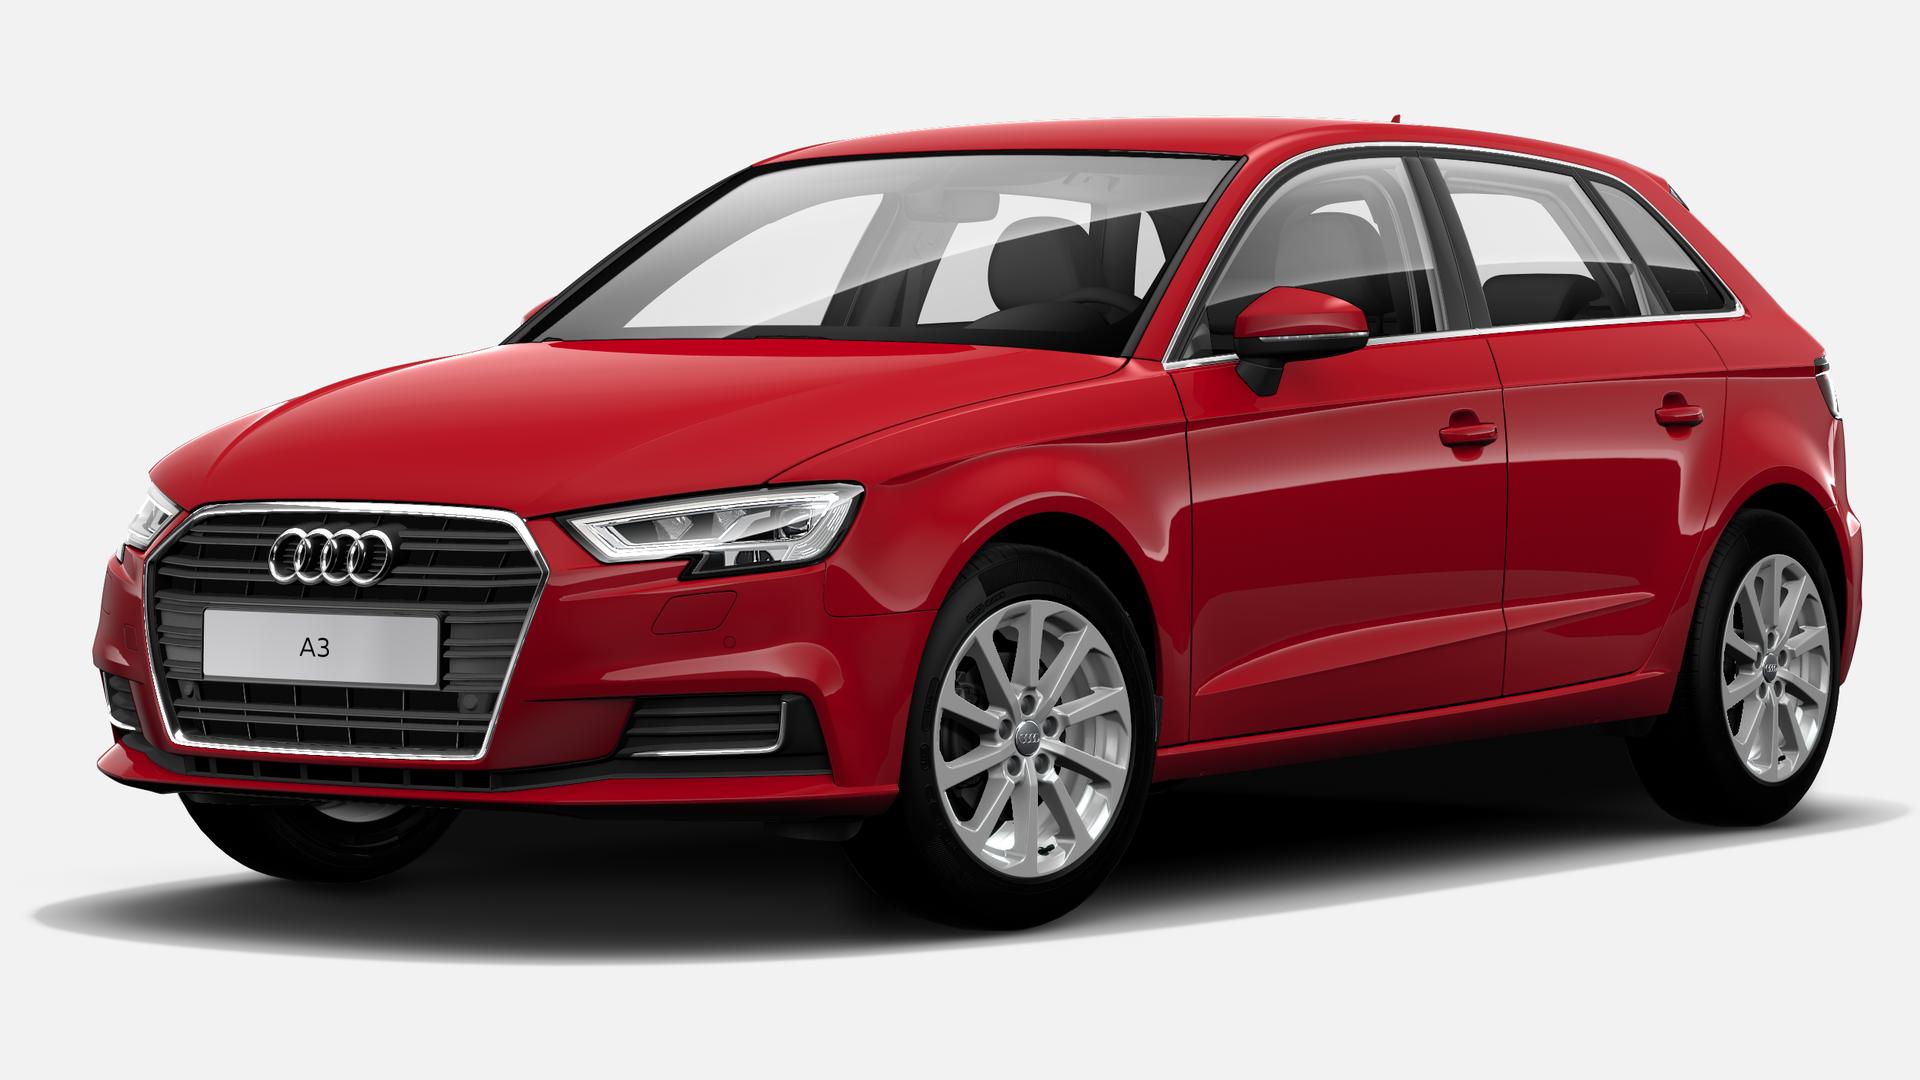 Audi A3 Sportback 1.6 TDI Design Edition S-tronic 85 kW (116 CV)  nuevo en Lugo